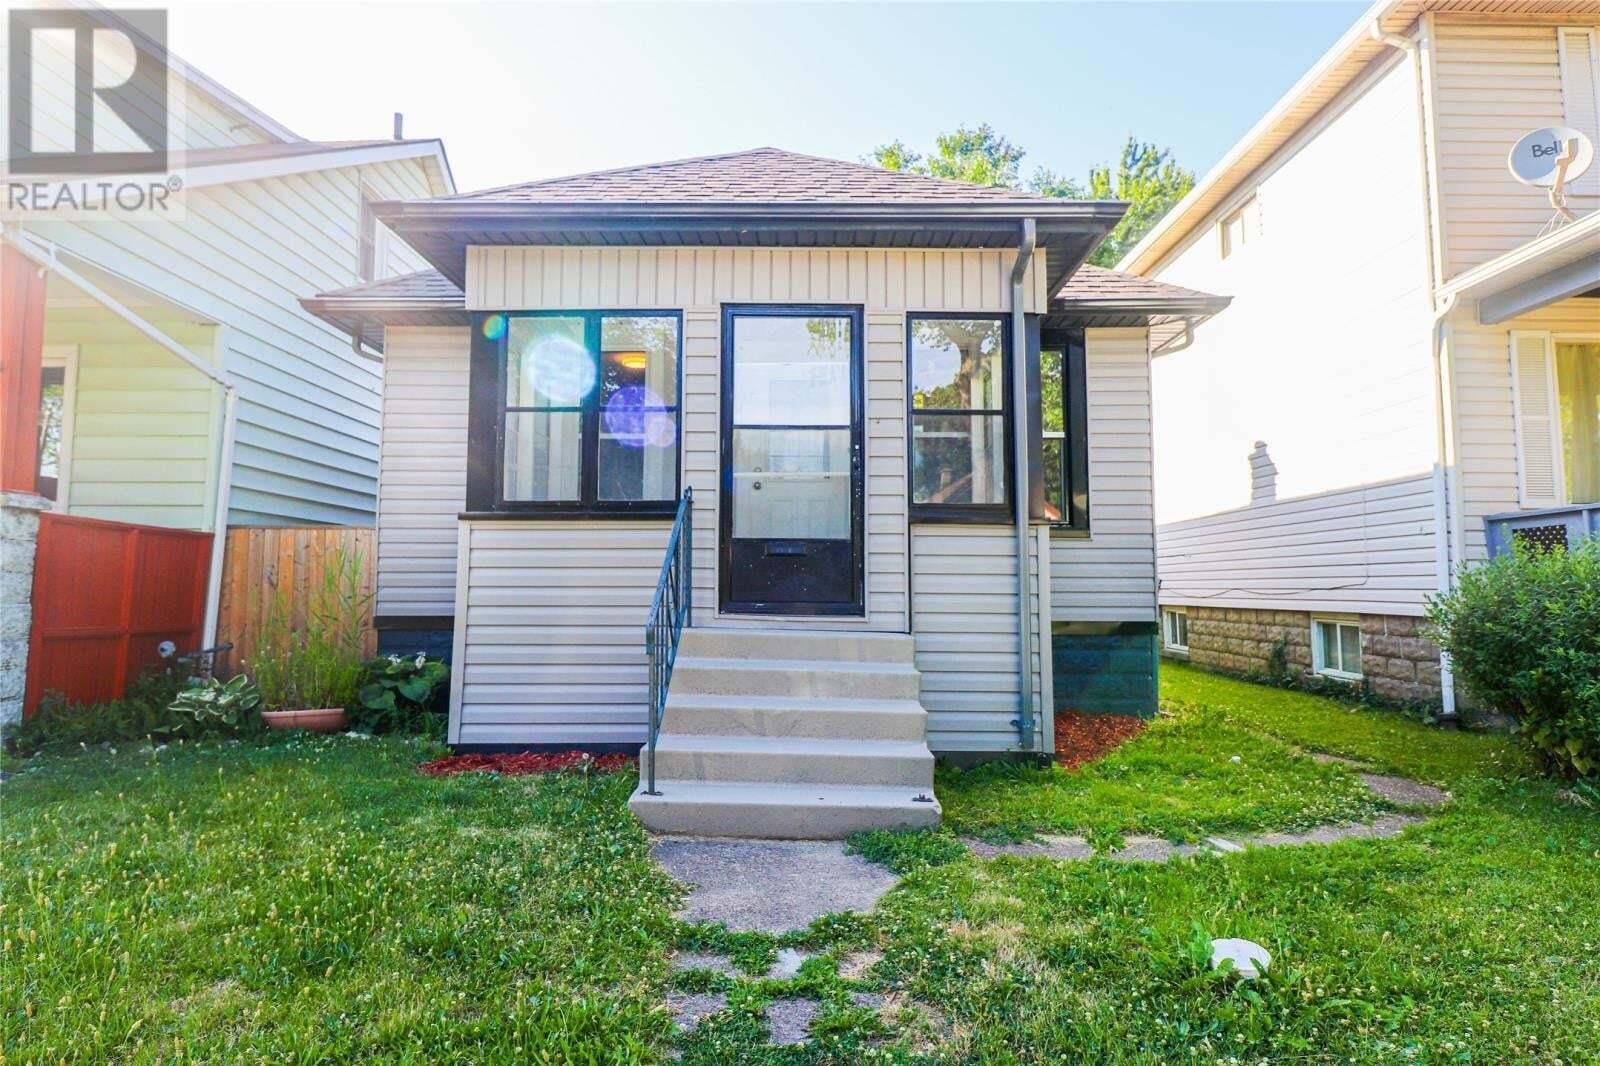 House for sale at 384 Ellis St West Windsor Ontario - MLS: 20008054